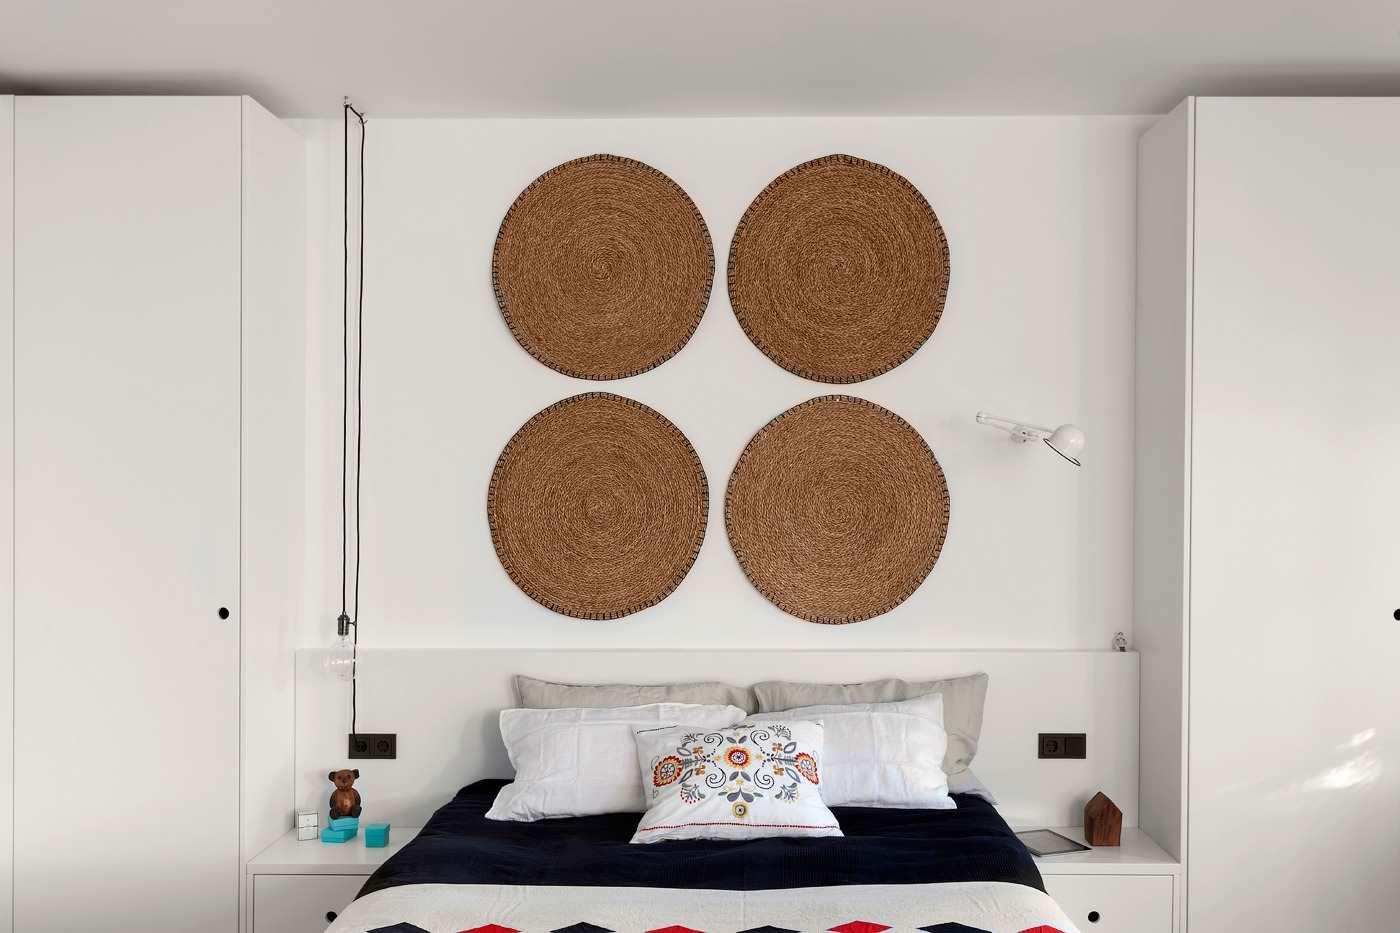 Дизайн однокомнатной квартира 43 кв.м. с фото (5)